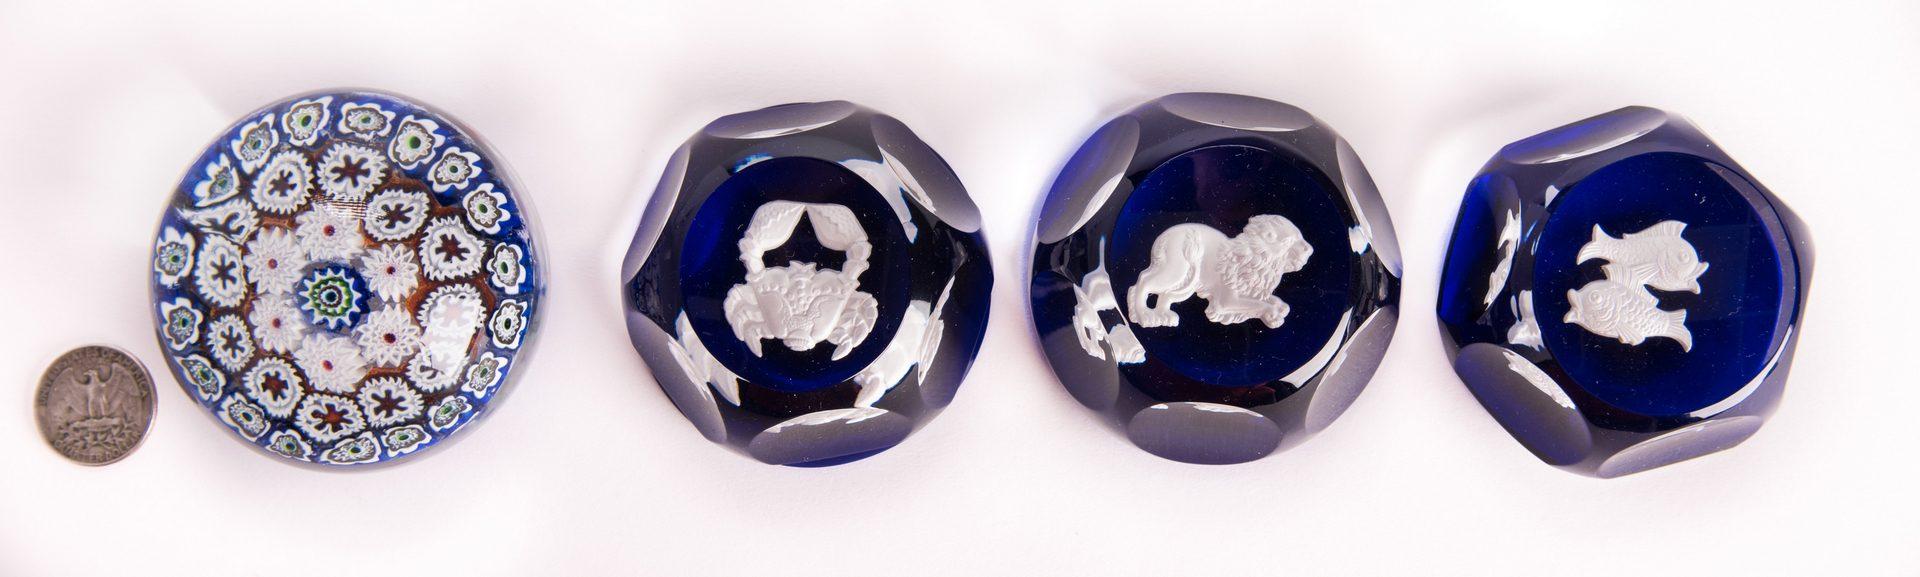 Lot 9: 5 Art Glass Items, incl. Steuben & Baccarat